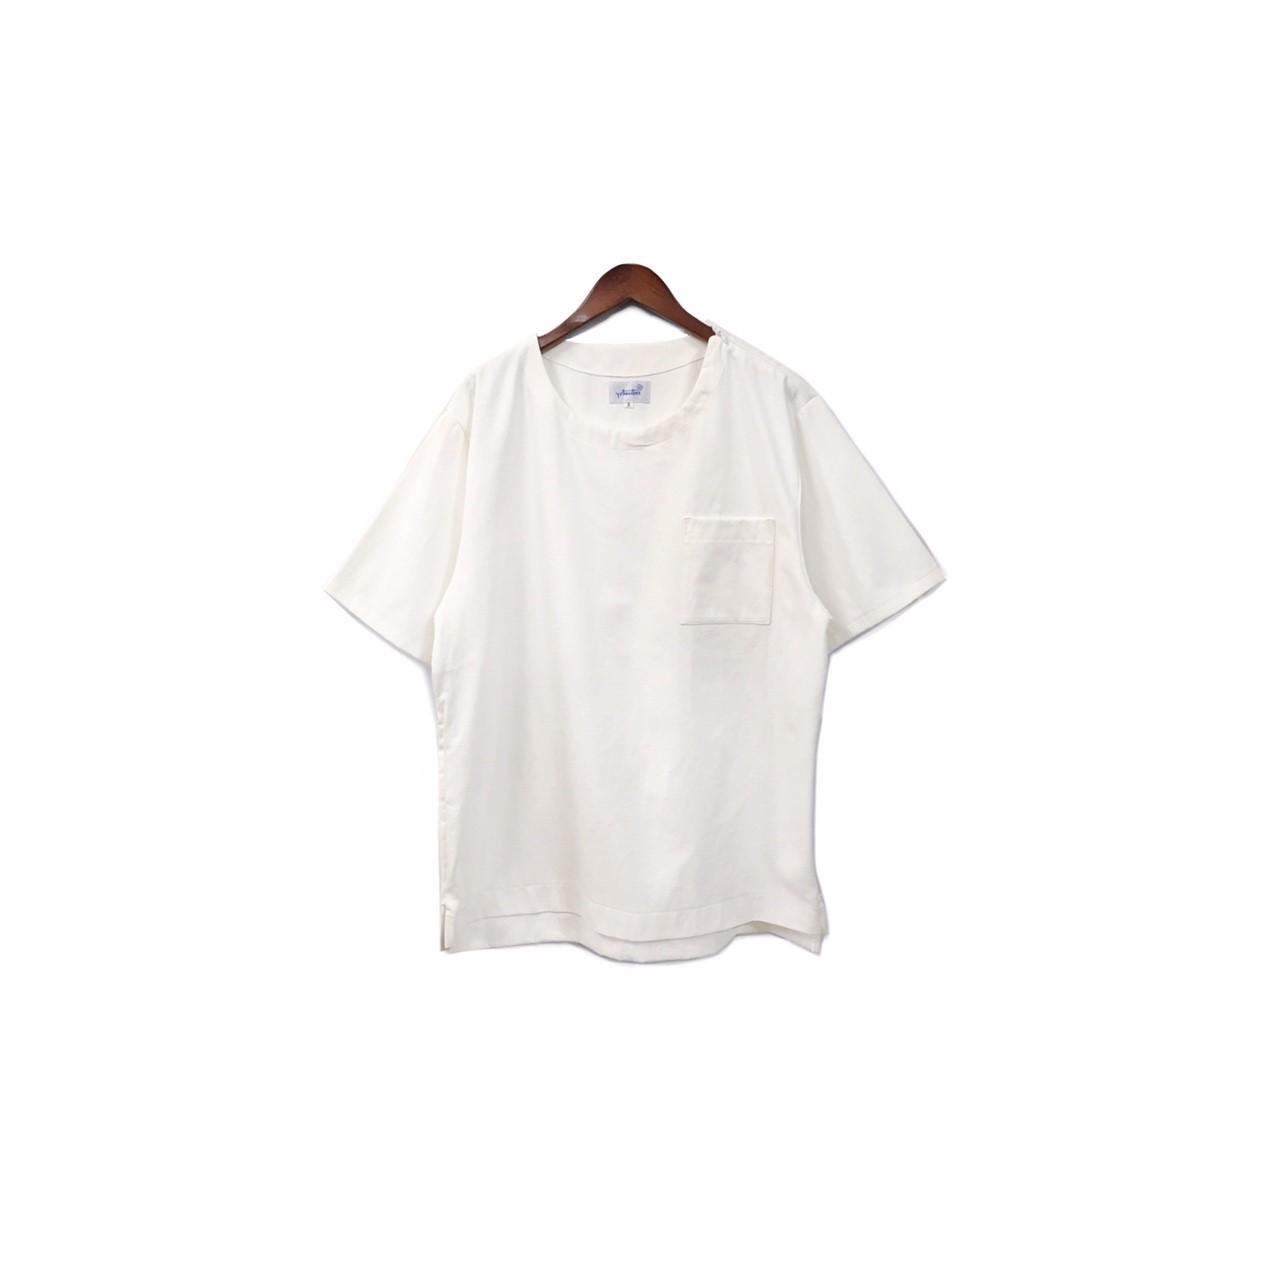 yotsuba - Shortsleeve Denim Tops / White ¥13000+tax